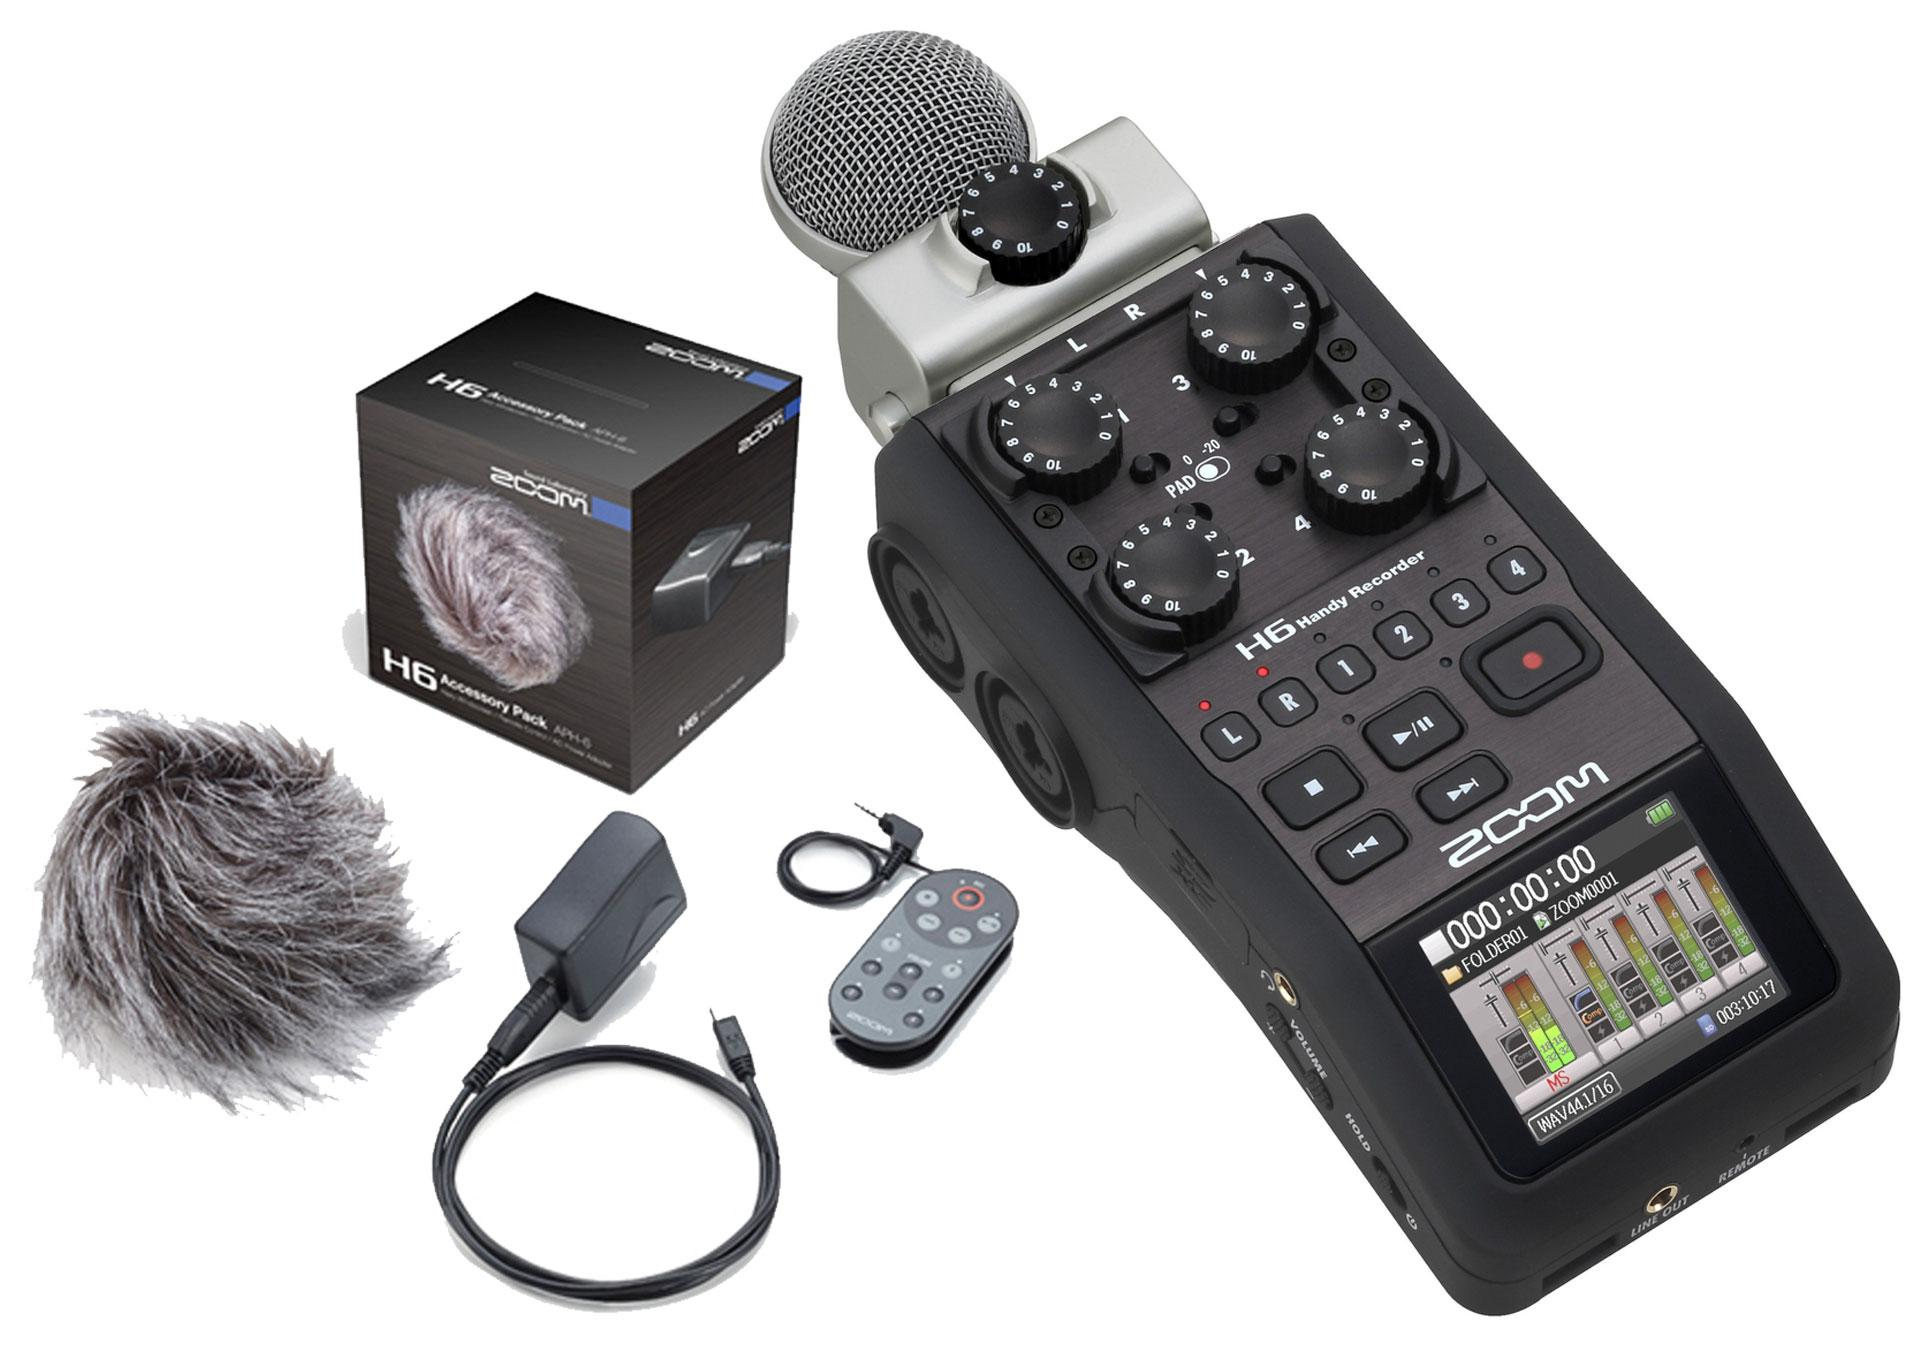 Zoom H6 APH 6 portabler Recorder Set